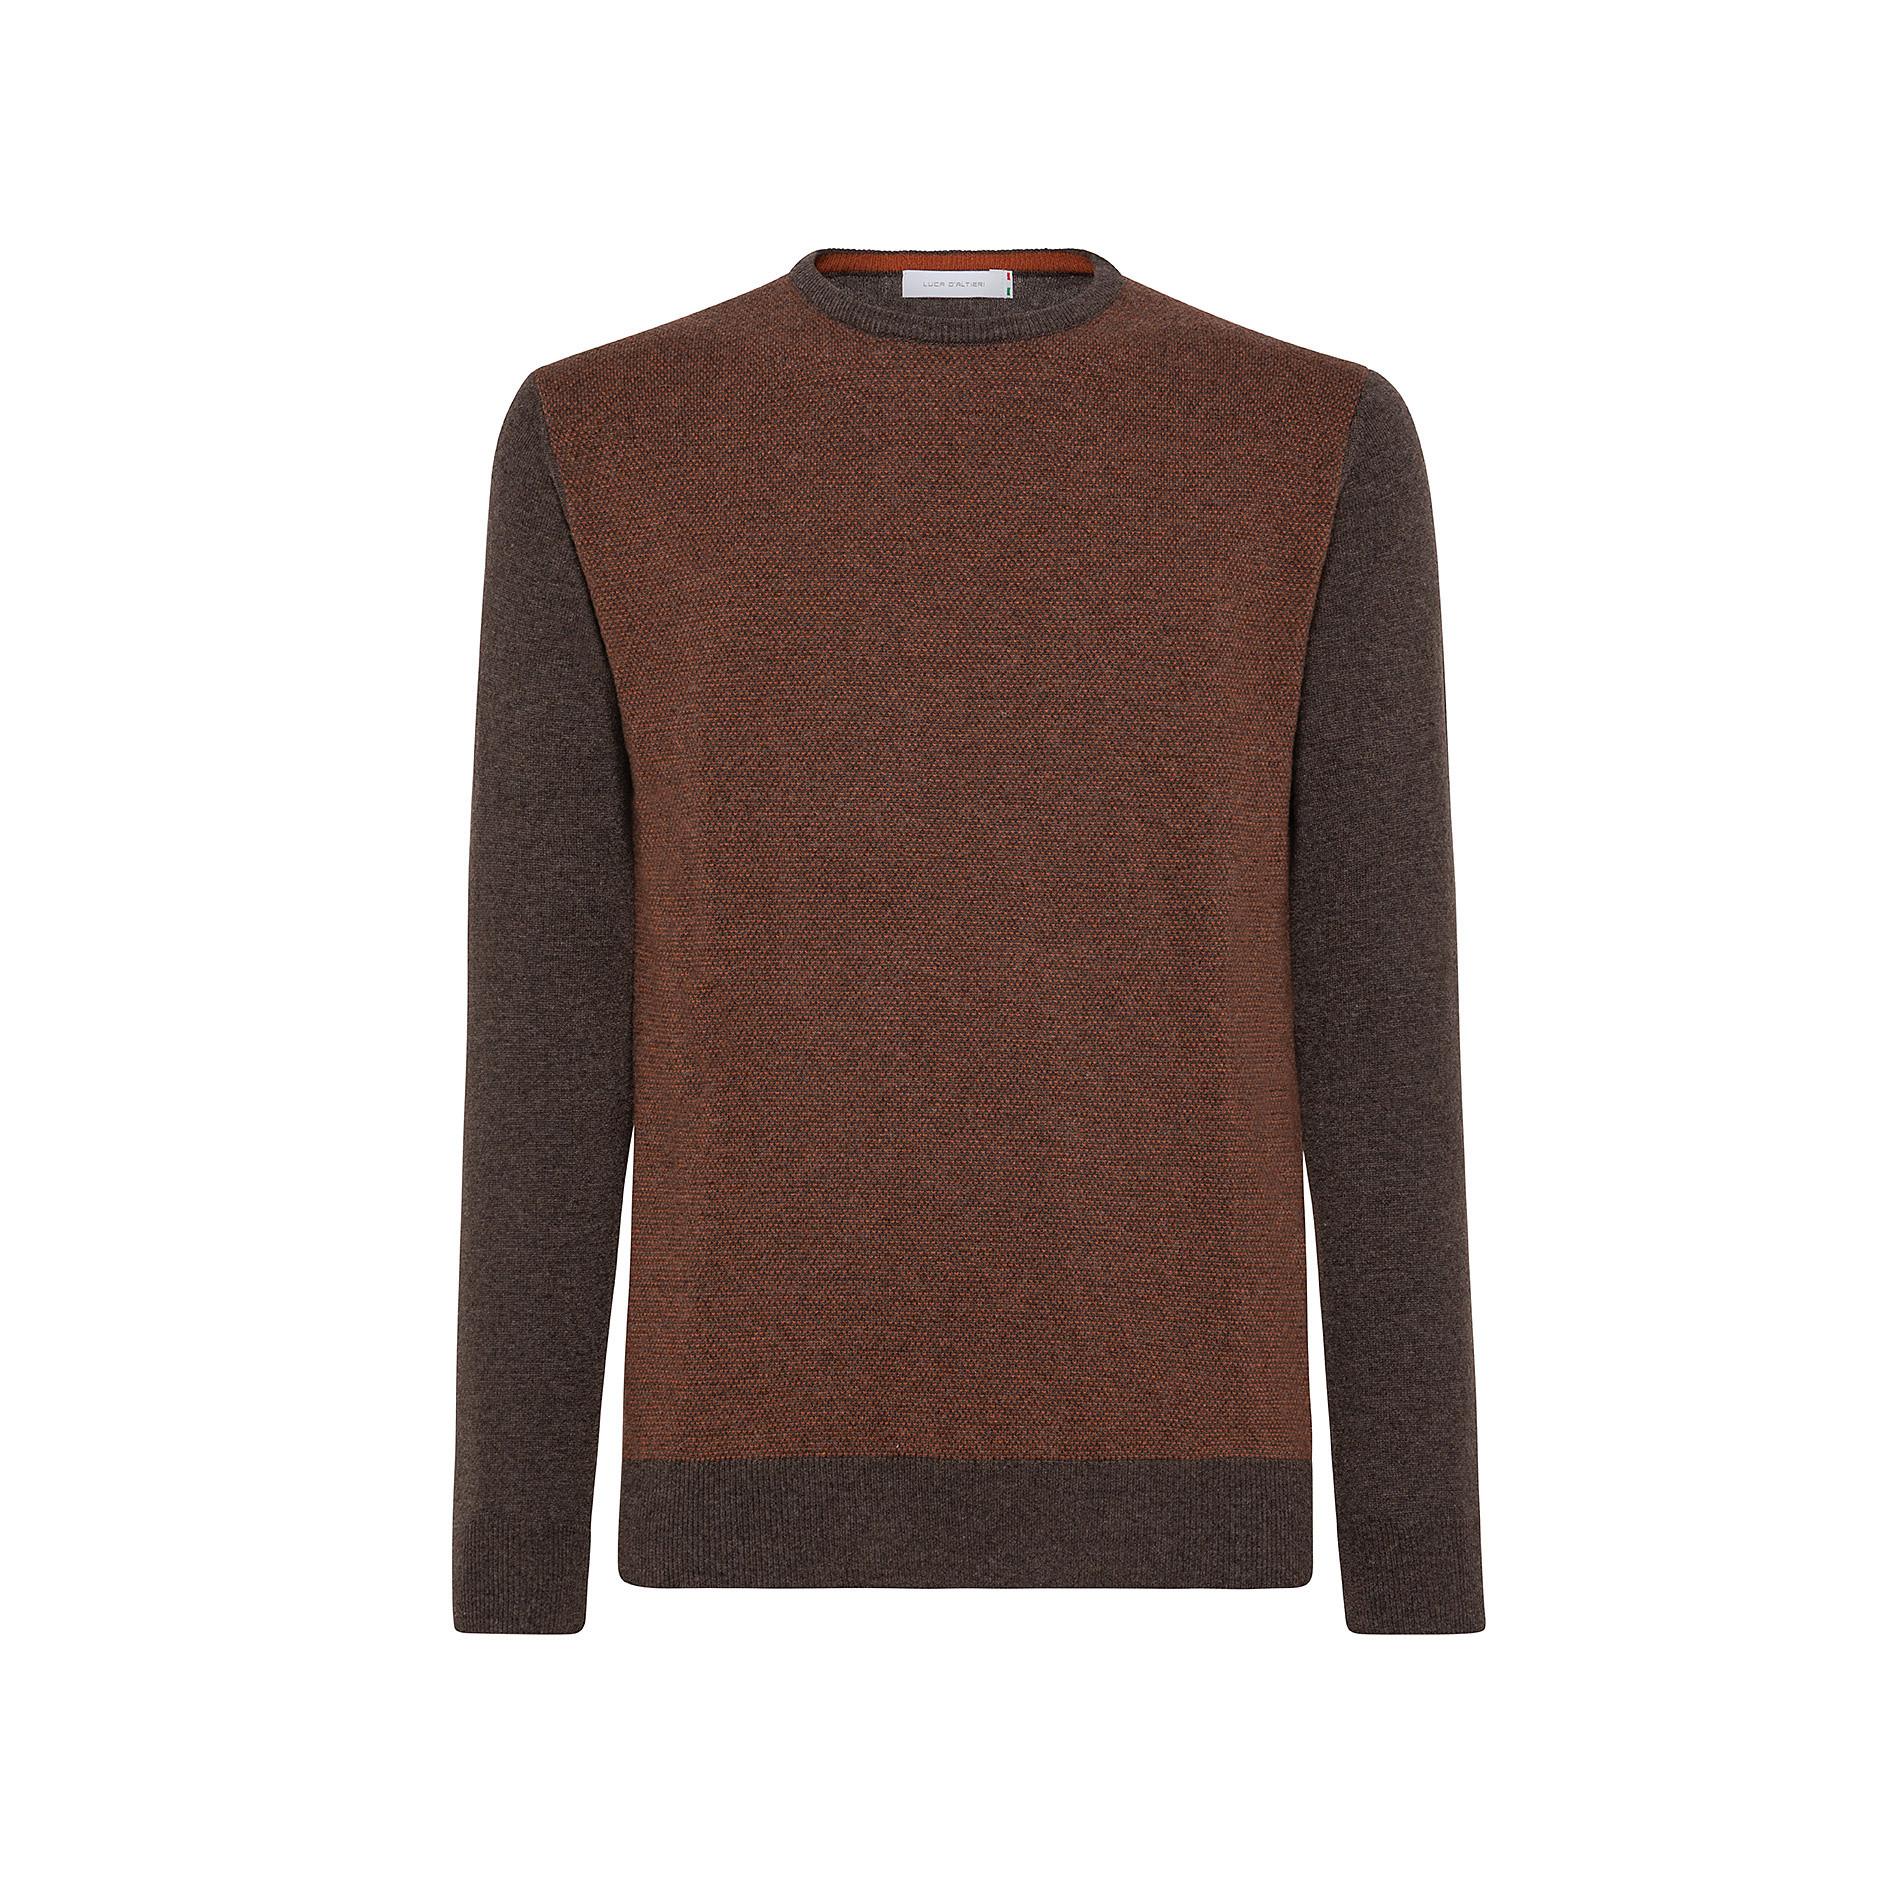 Pullover girocollo misto lana motivo piquet, Marrone, large image number 0